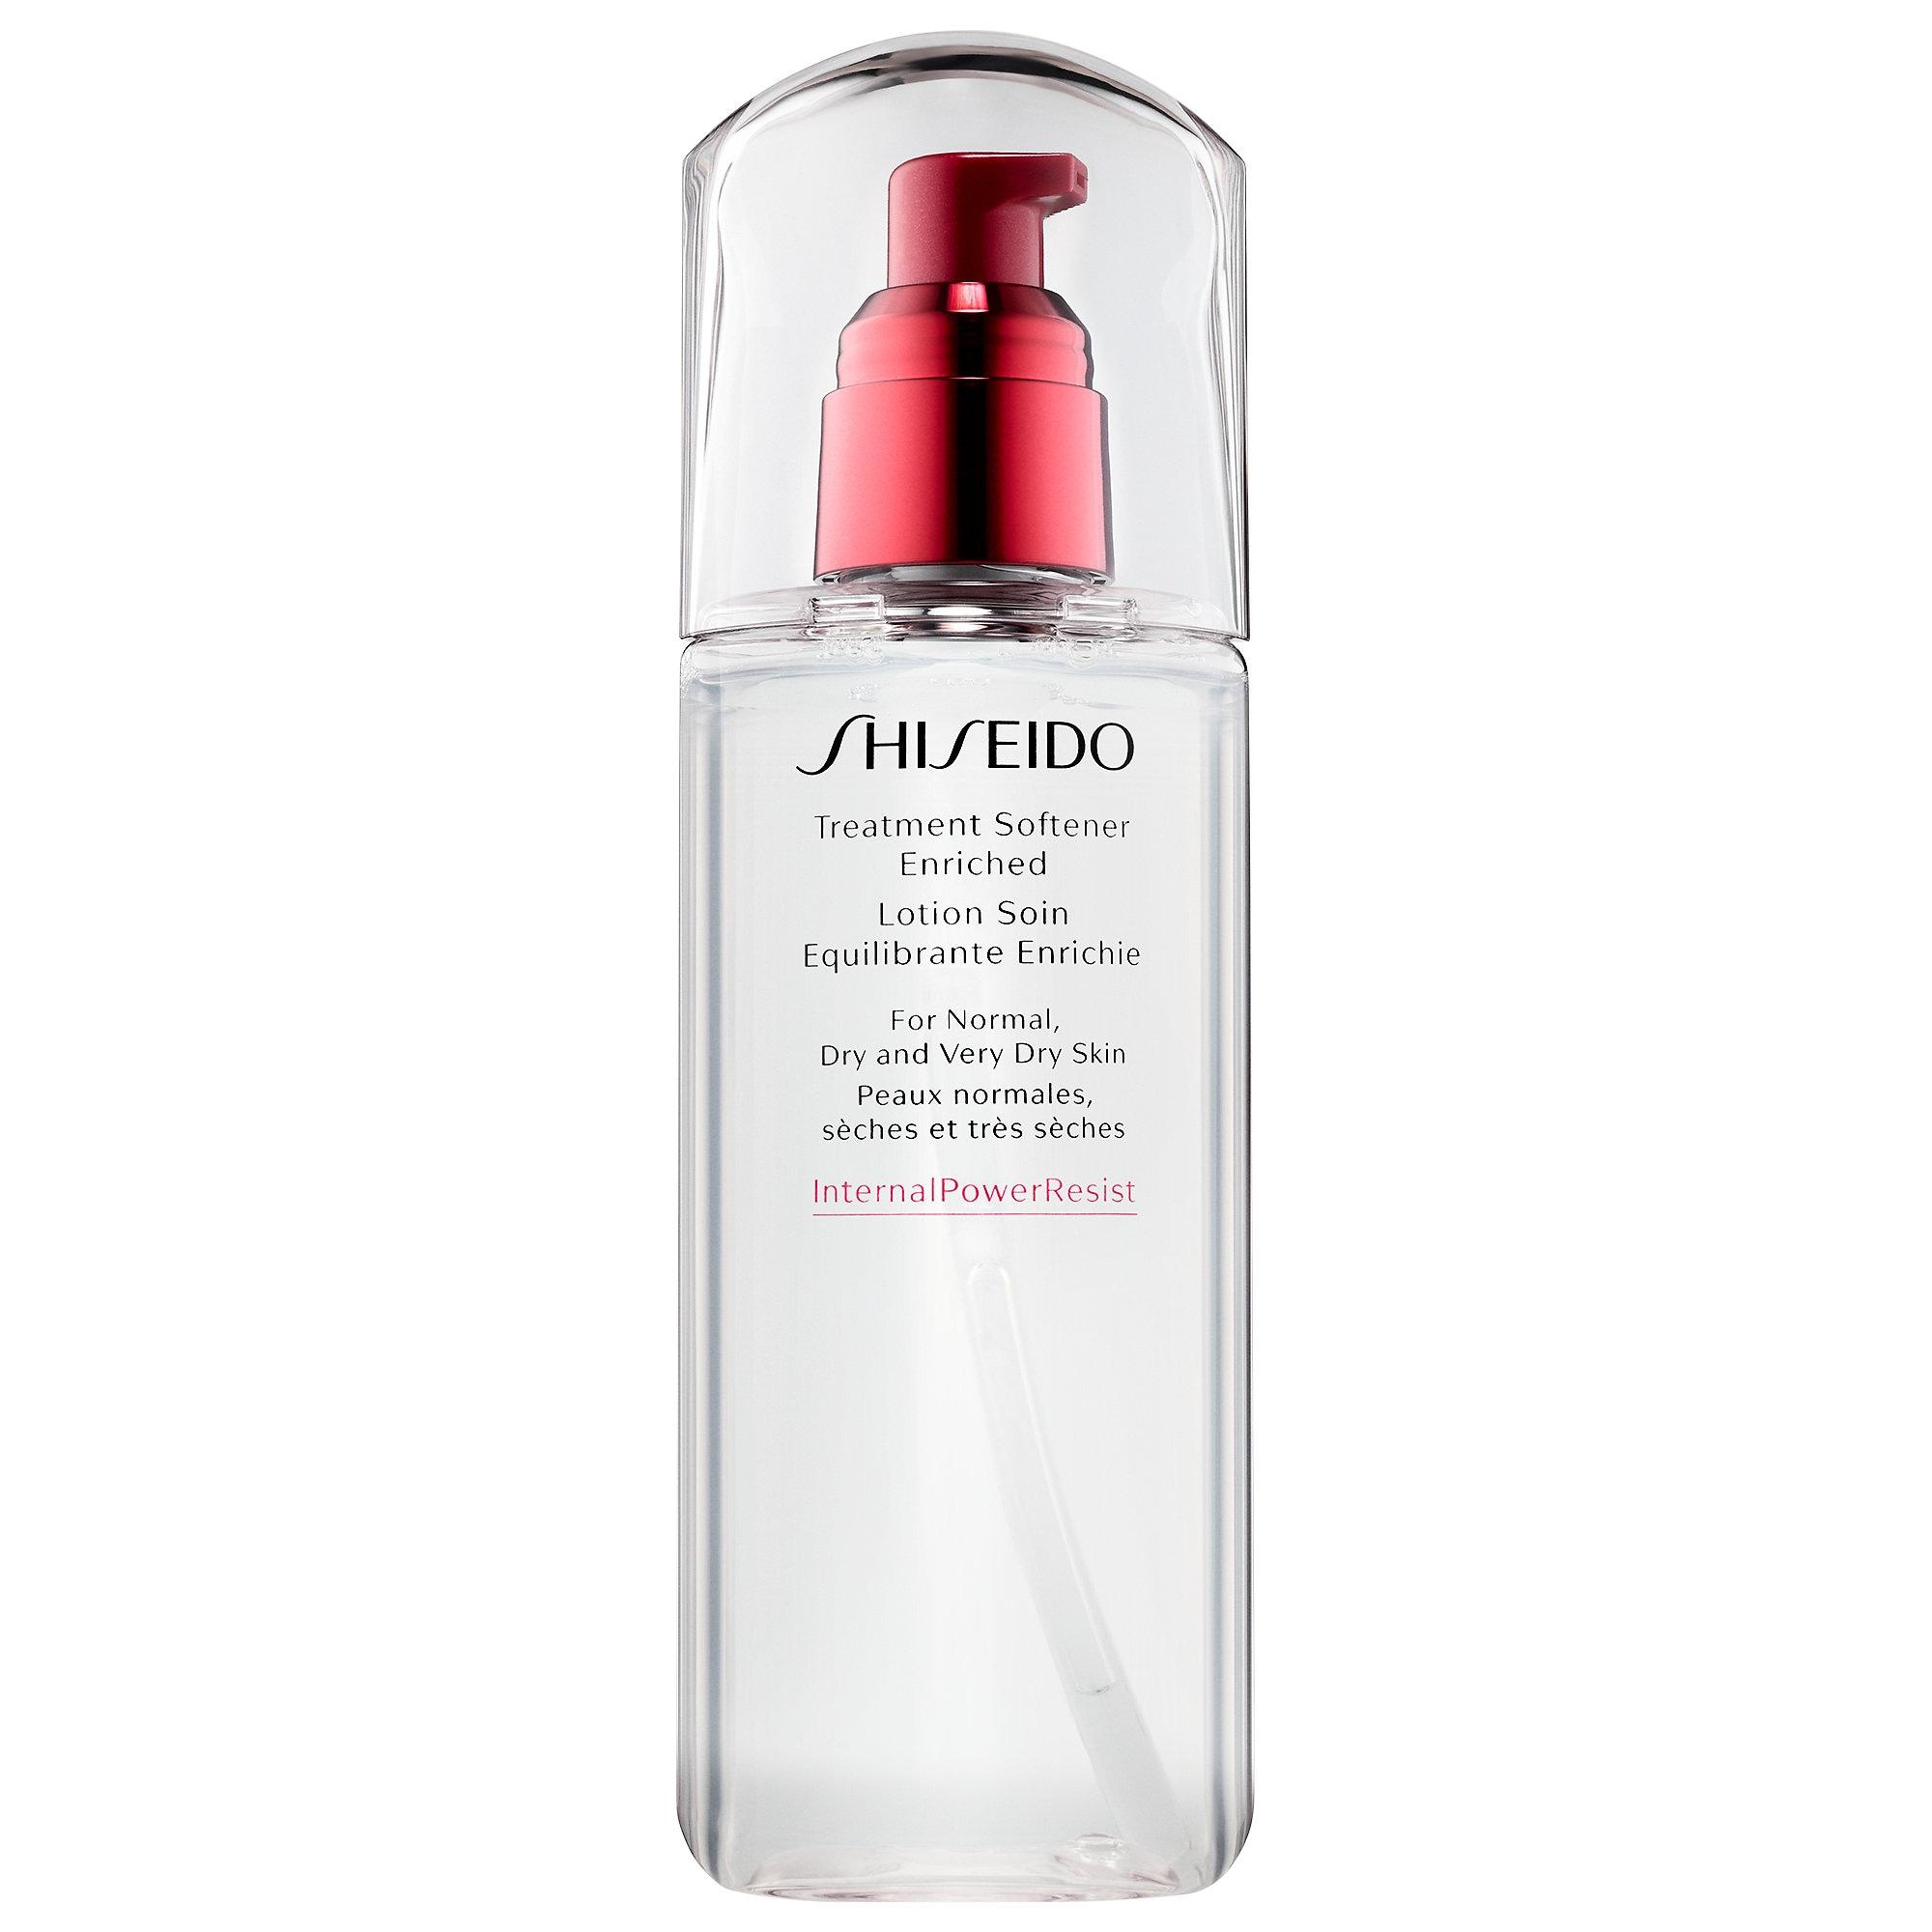 Shiseido Treatment Softener Enriched